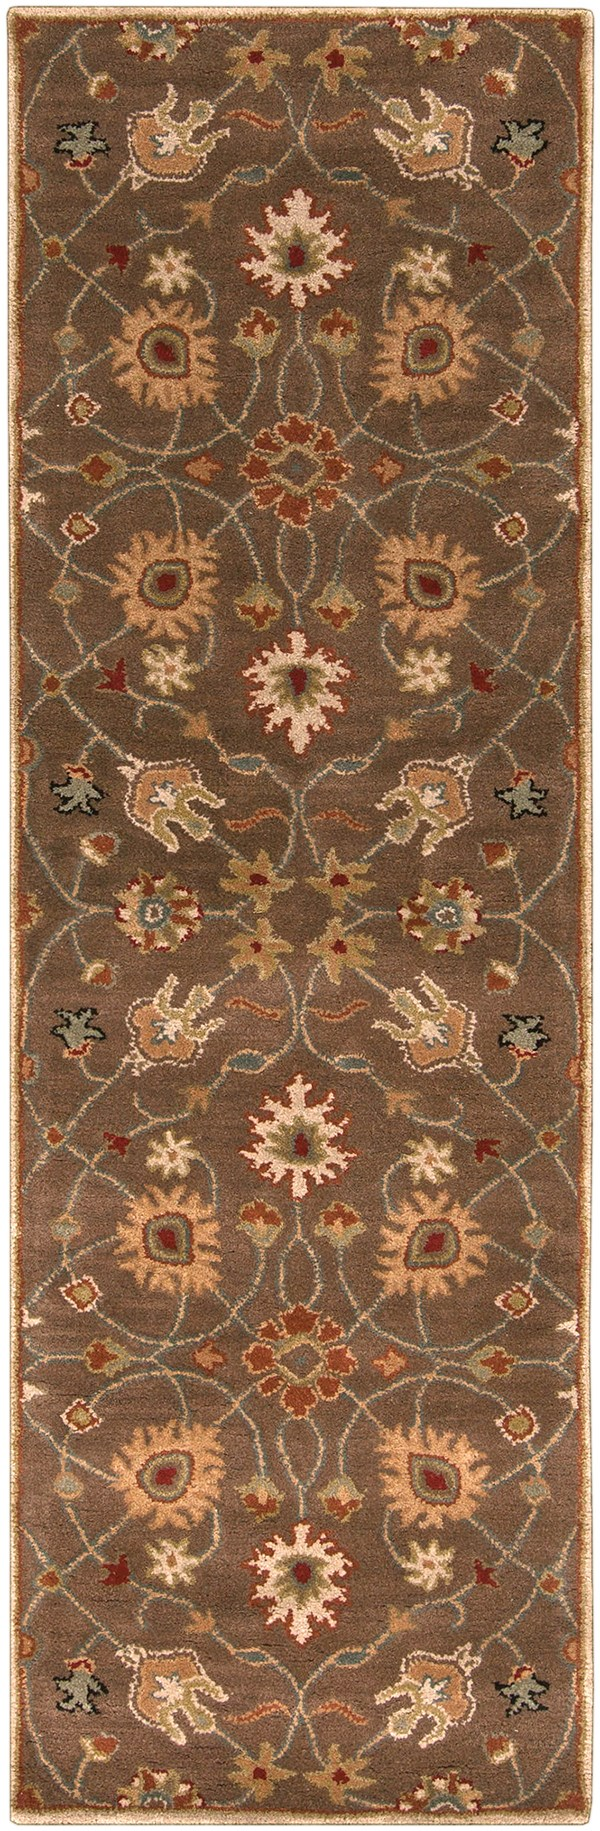 Dark Brown, Rust, Olive, Camel, Black Traditional / Oriental Area Rug